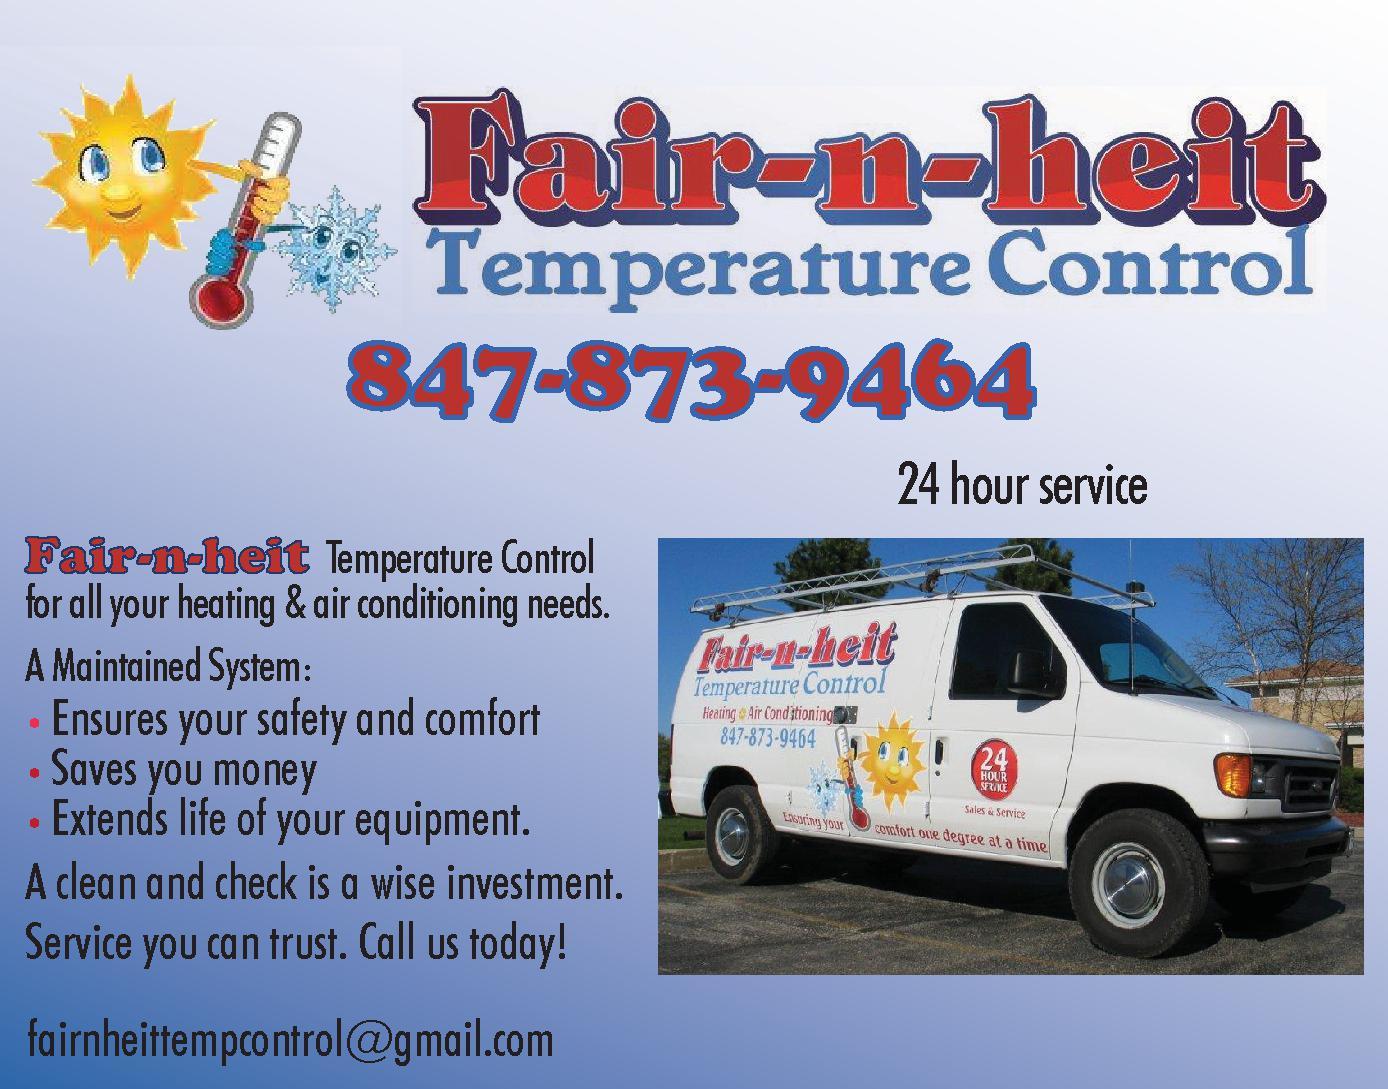 Fair-n-heit Temperature Control